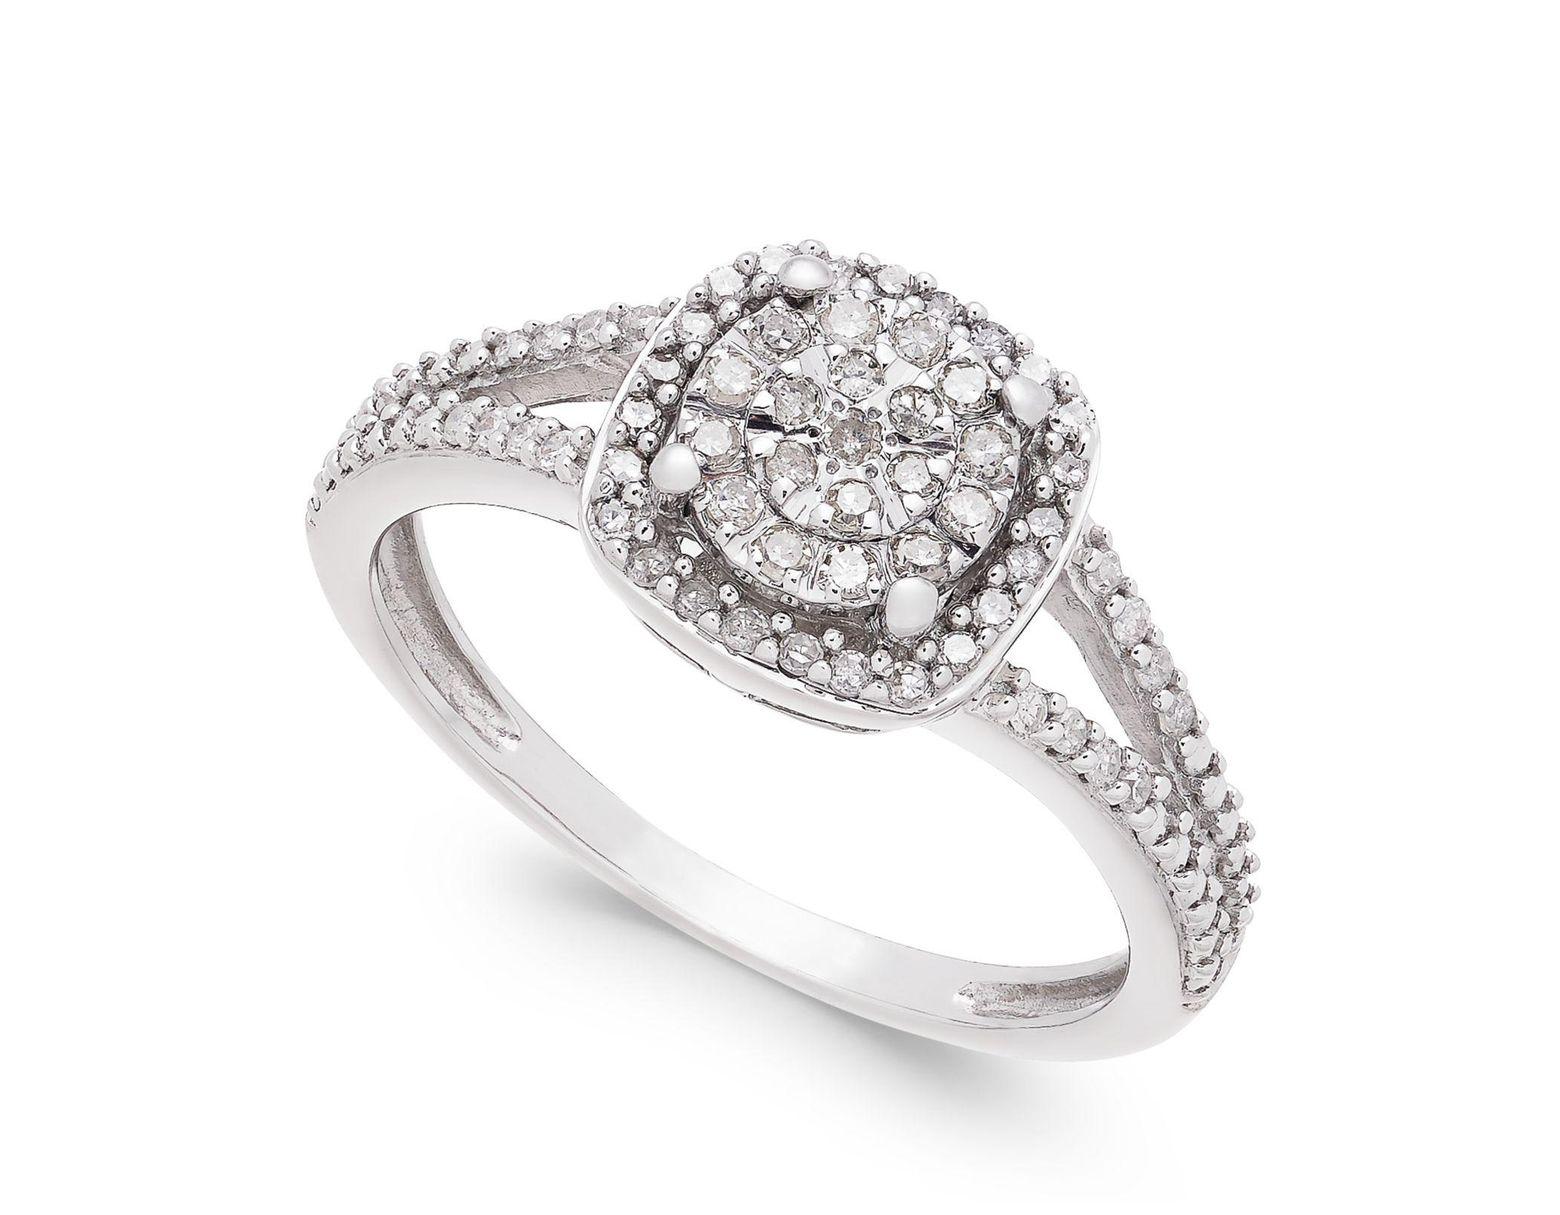 d21c5c4fd38ed Women's Metallic Cushion-cut Diamond Promise Ring (1/4 Ct. T.w.) In  Sterling Silver